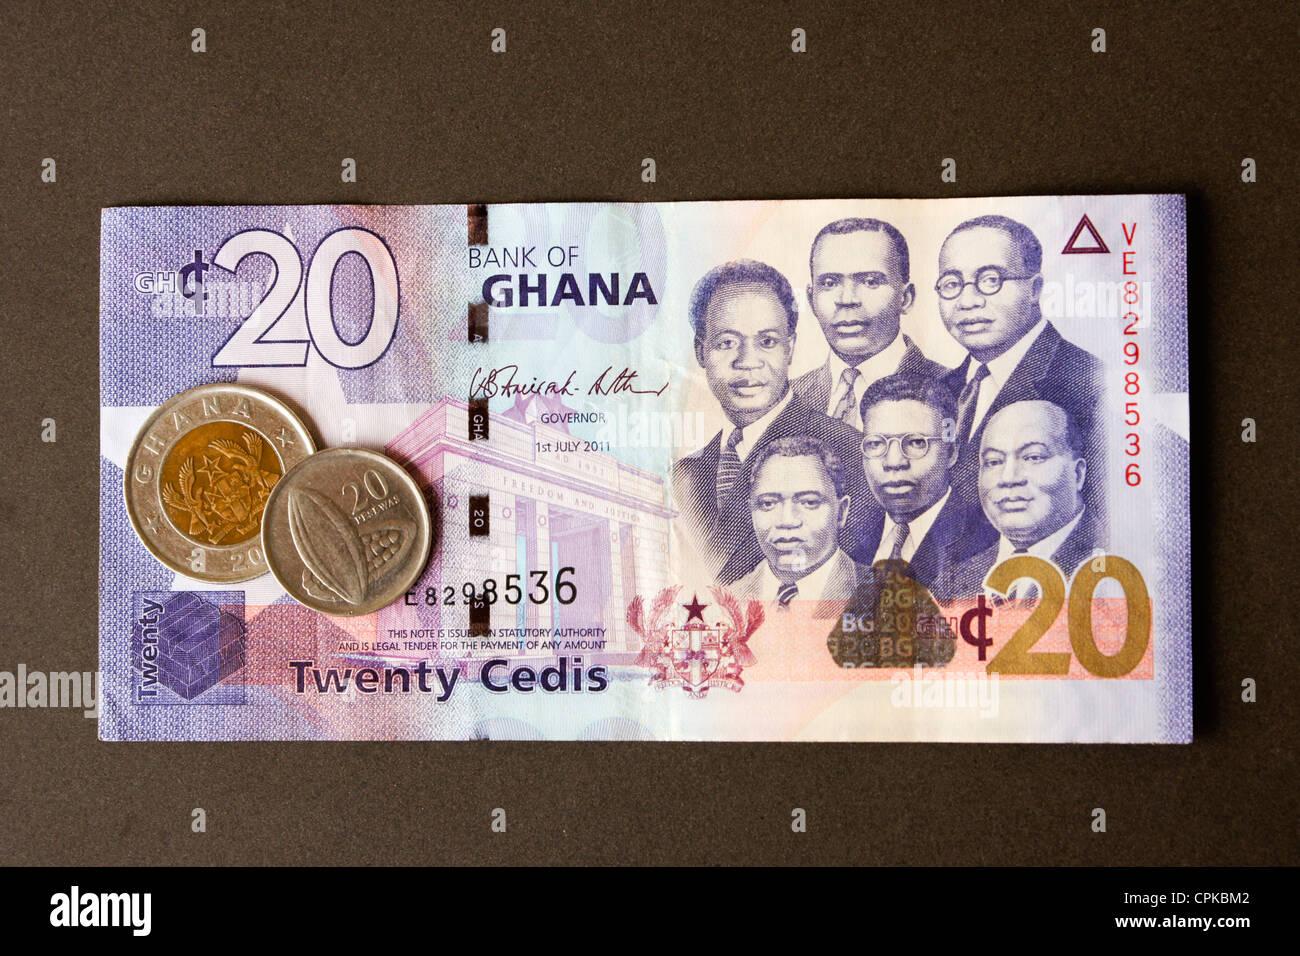 Currency of Ghana (cedi and pesewa) - Stock Image